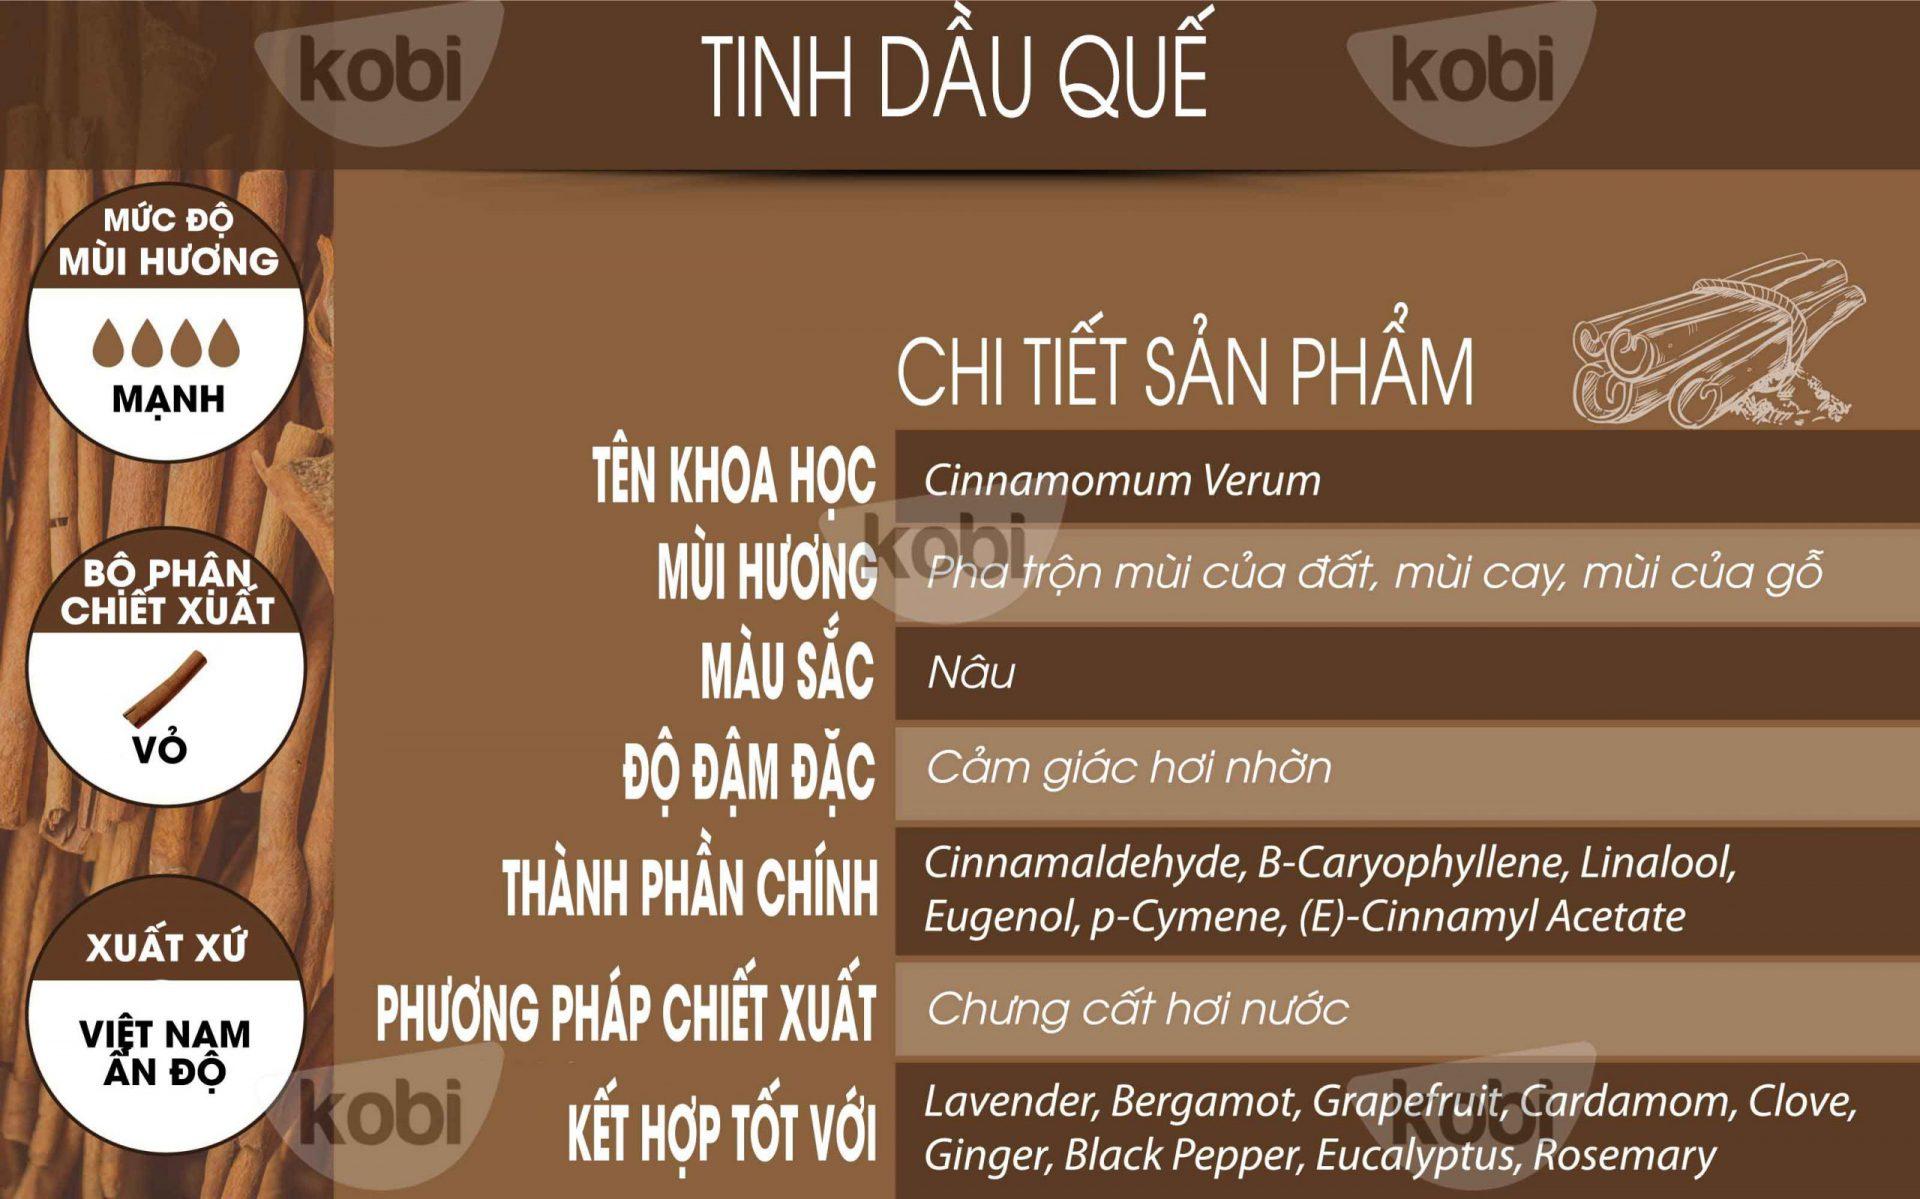 Tịnh dầu quế Kobi (Cinnamon essential oil)